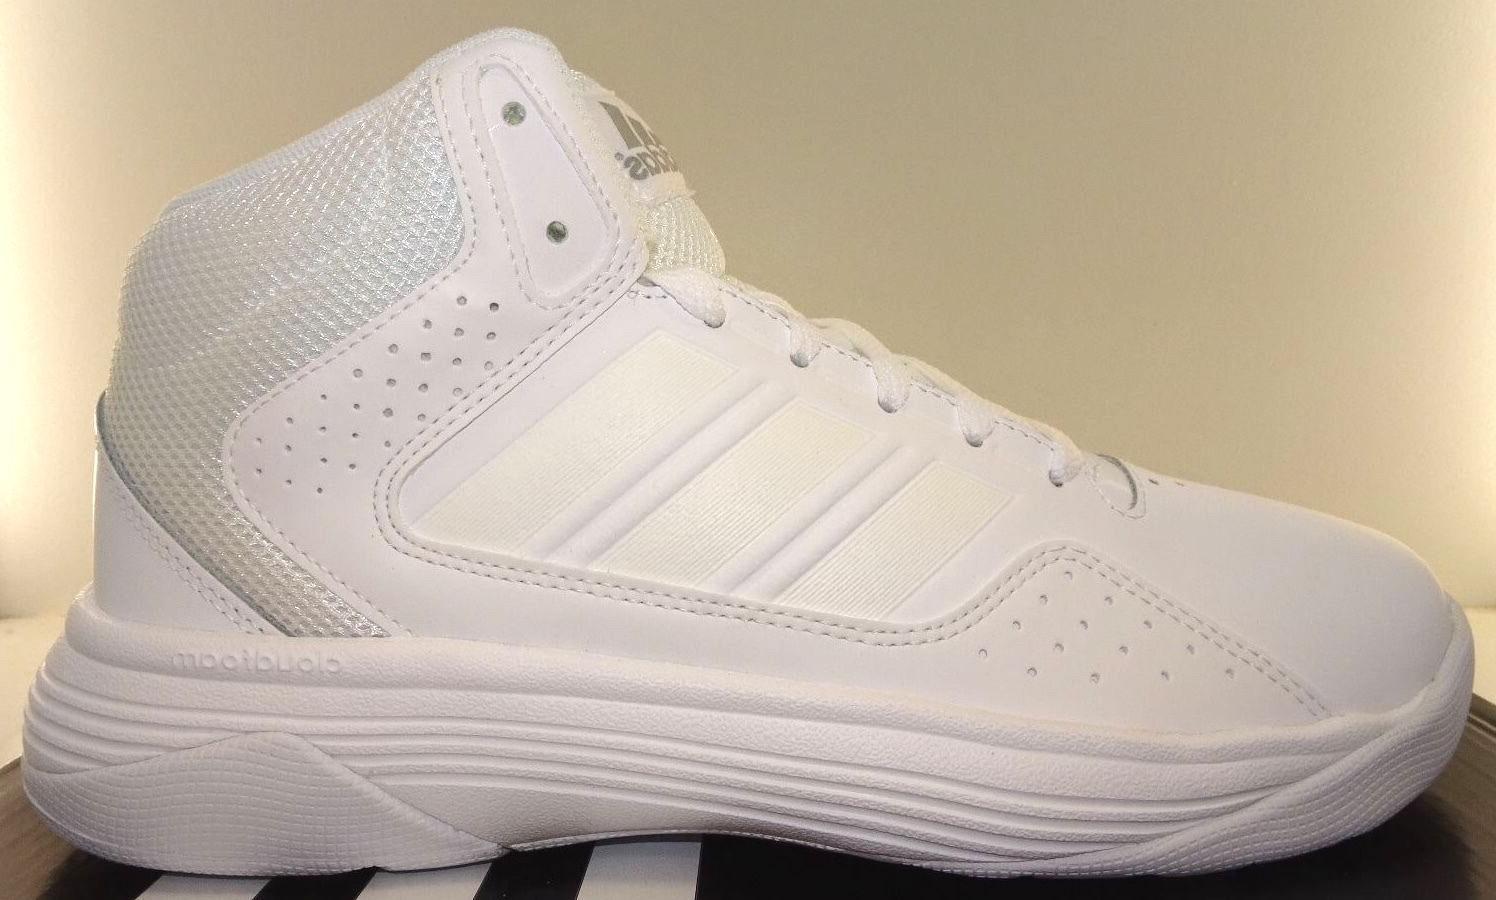 Adidas Ilation Men's -